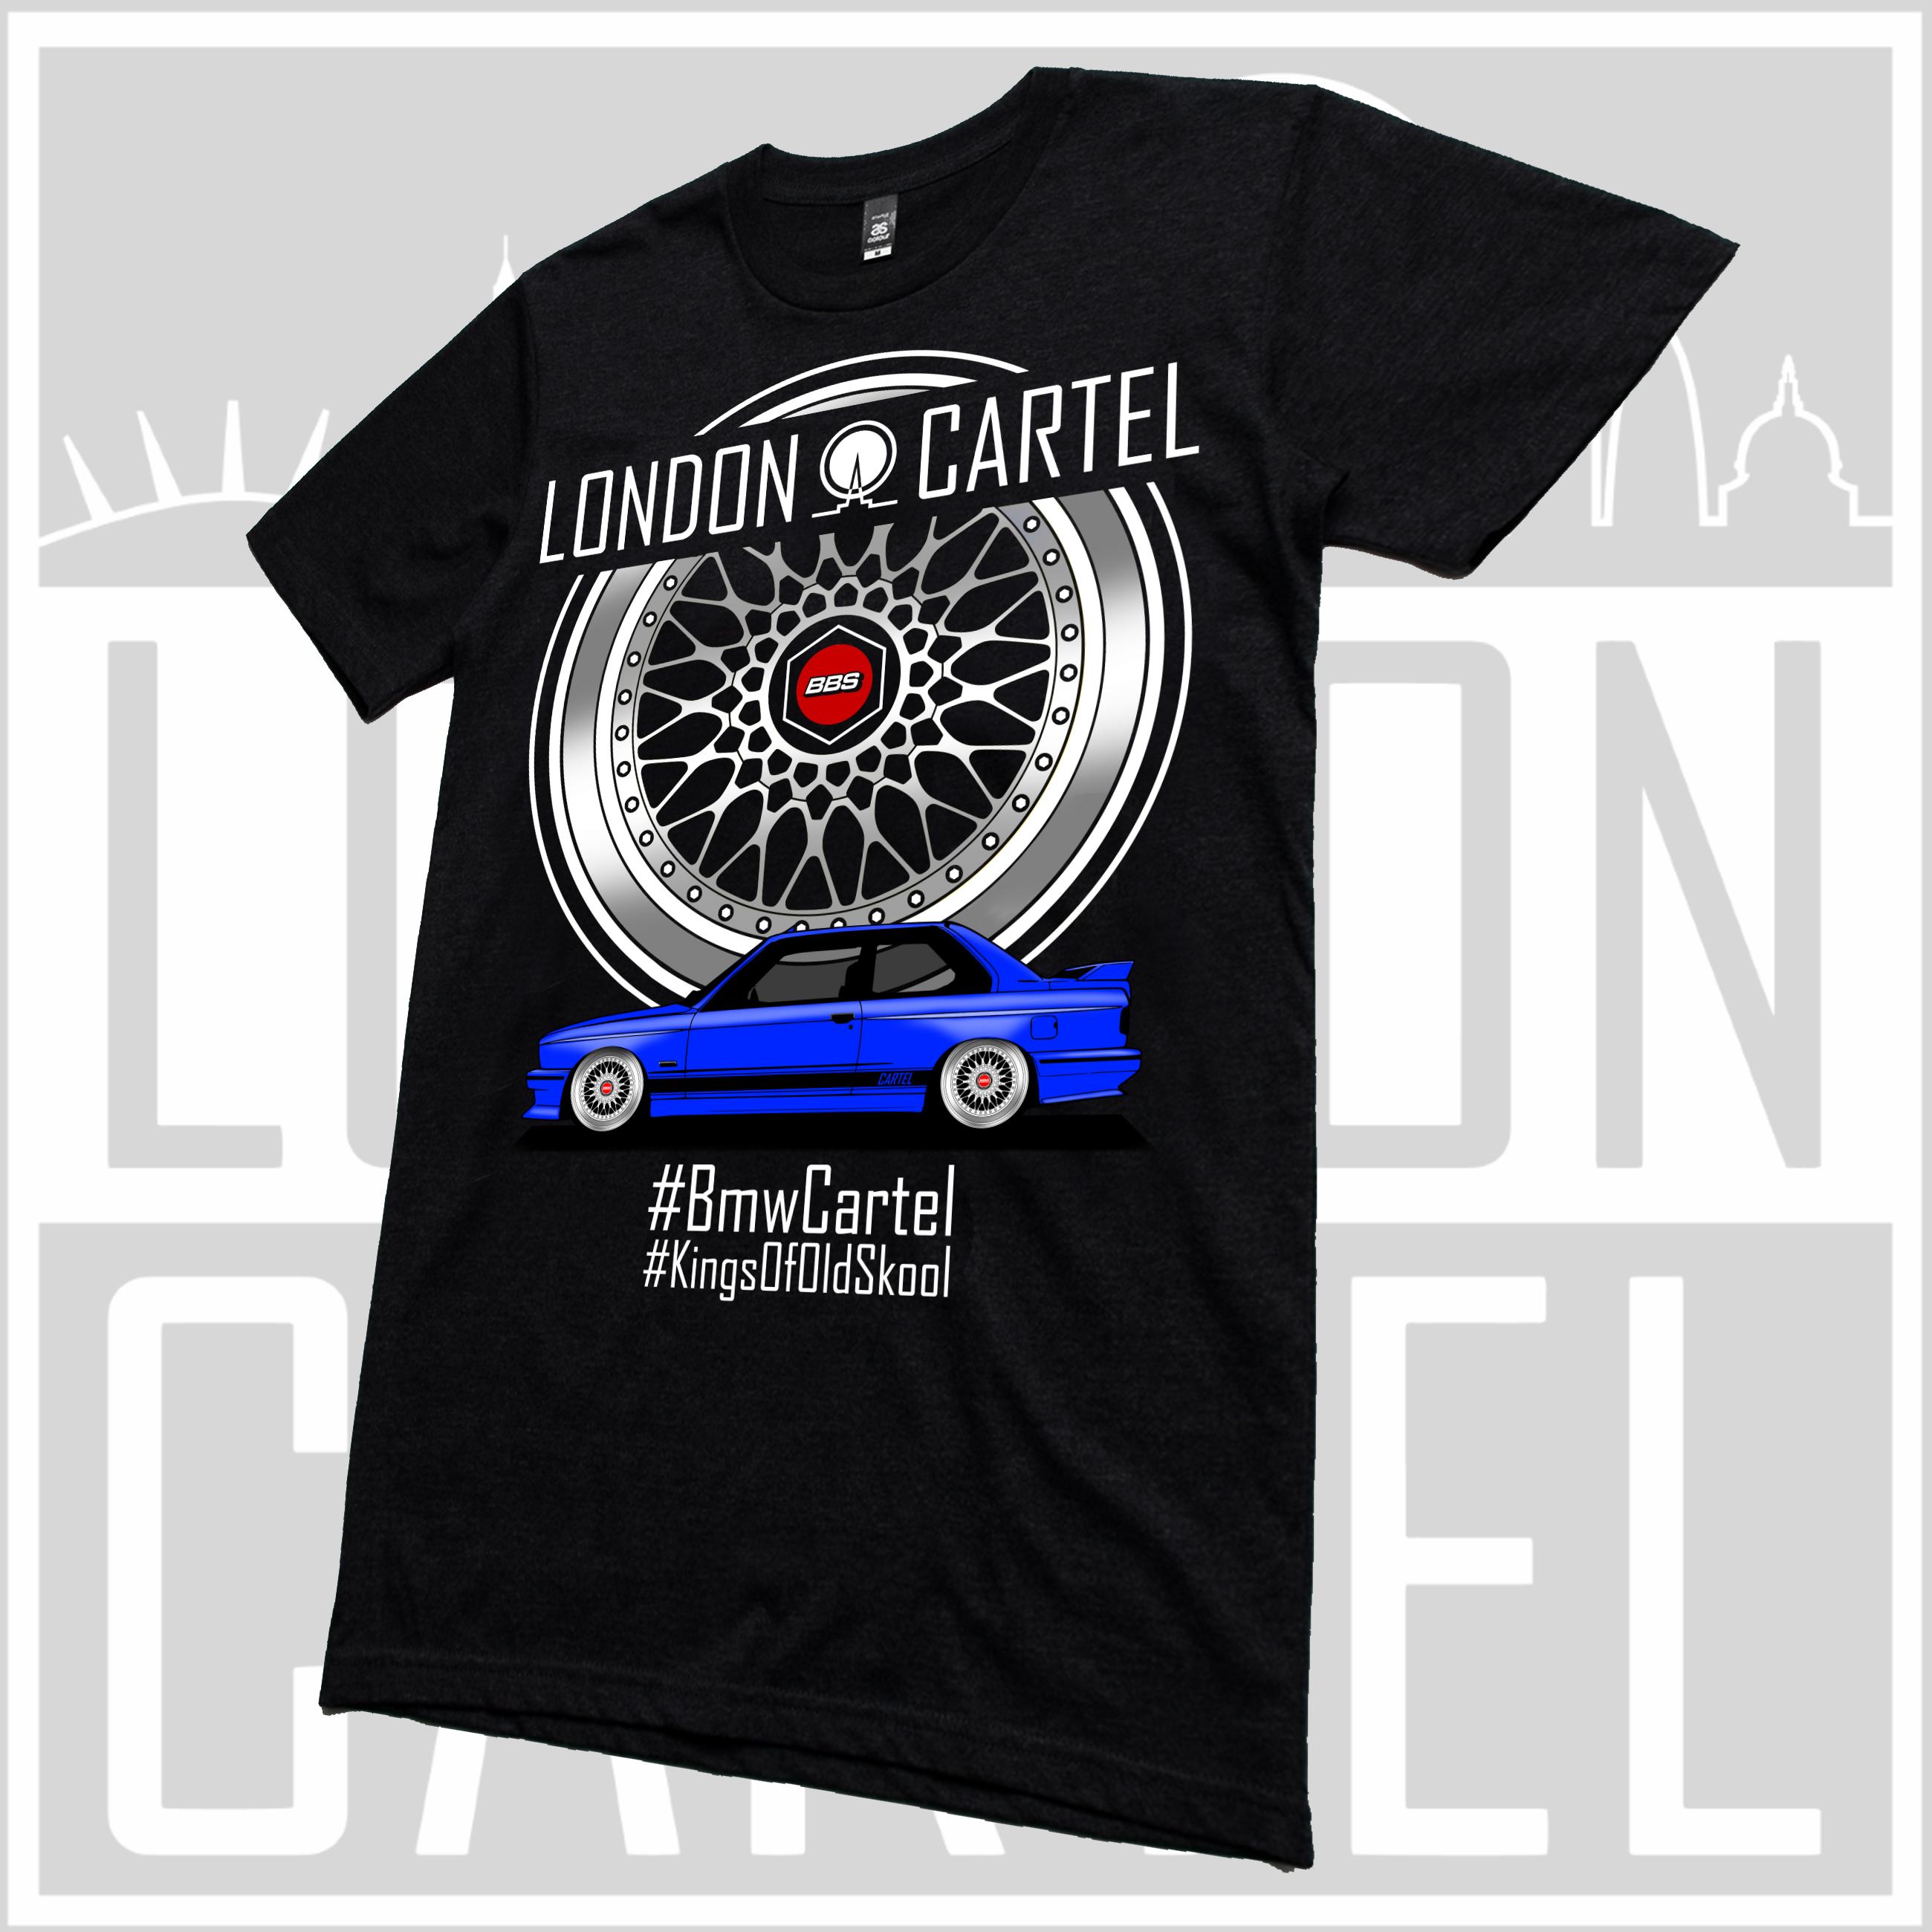 BMW M3 E30 >> Bmw Cartel T Shirt LCT009 - London Cartel